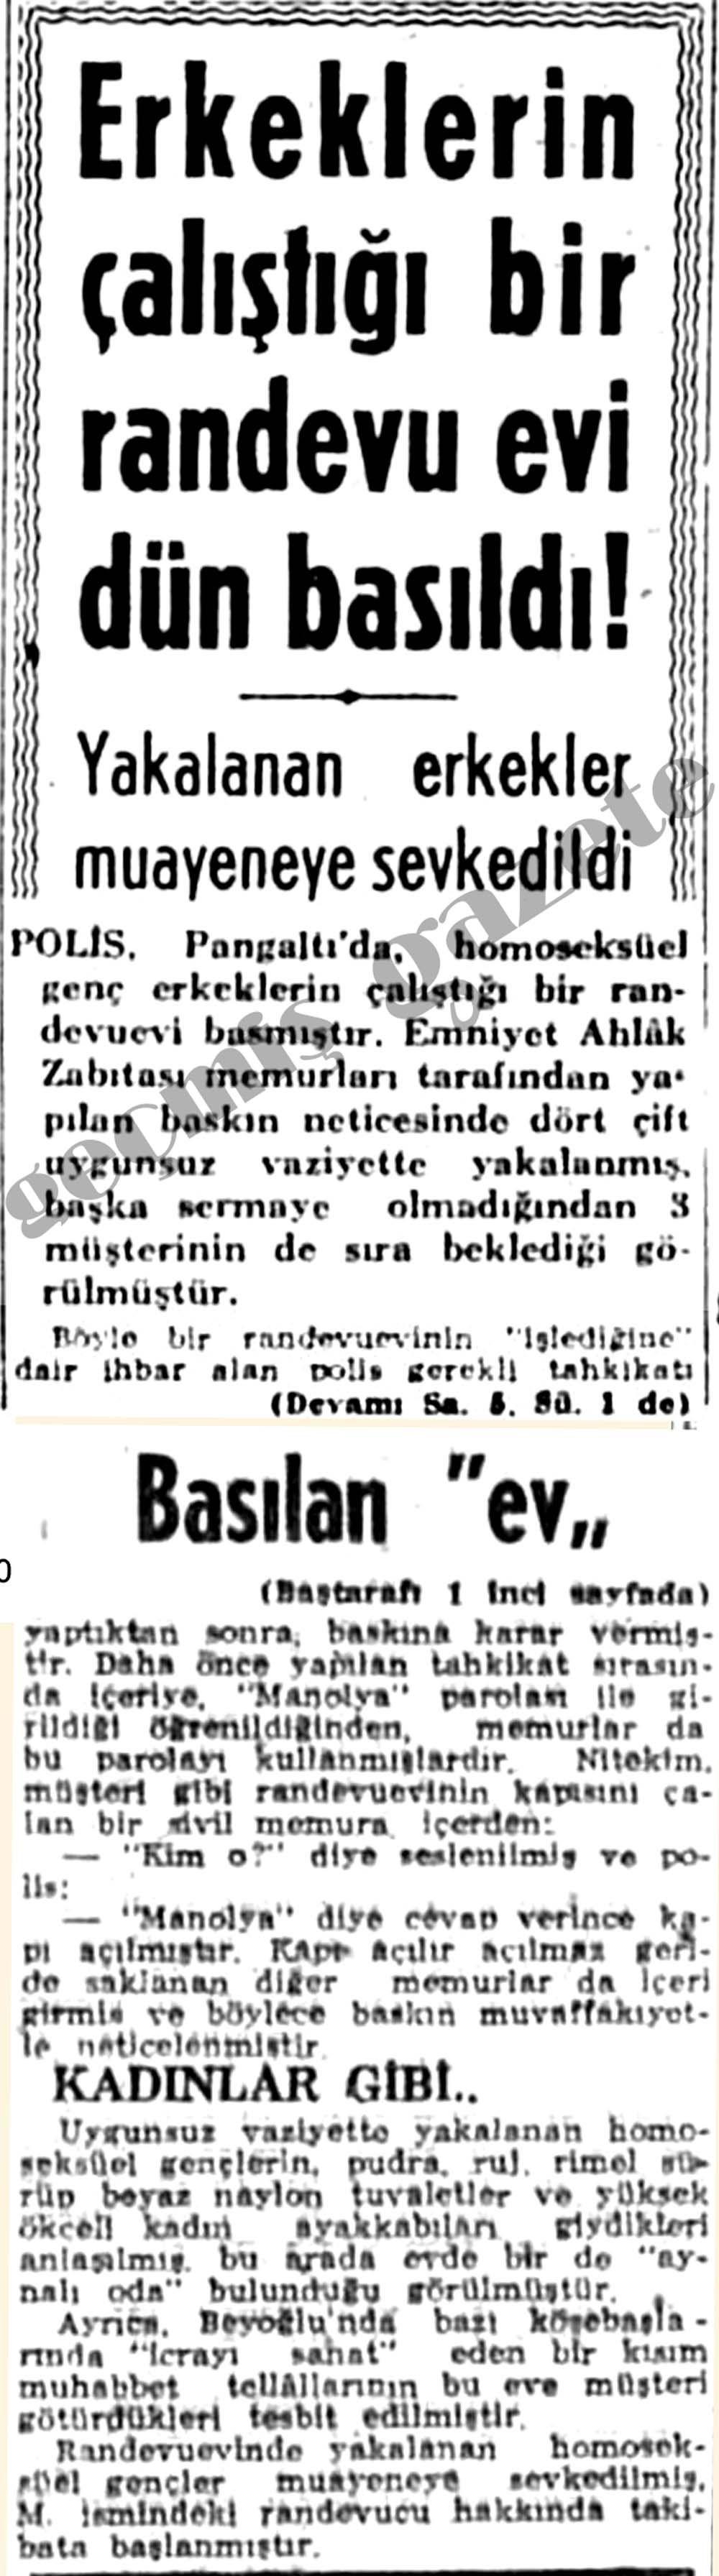 Türk travesti twitter